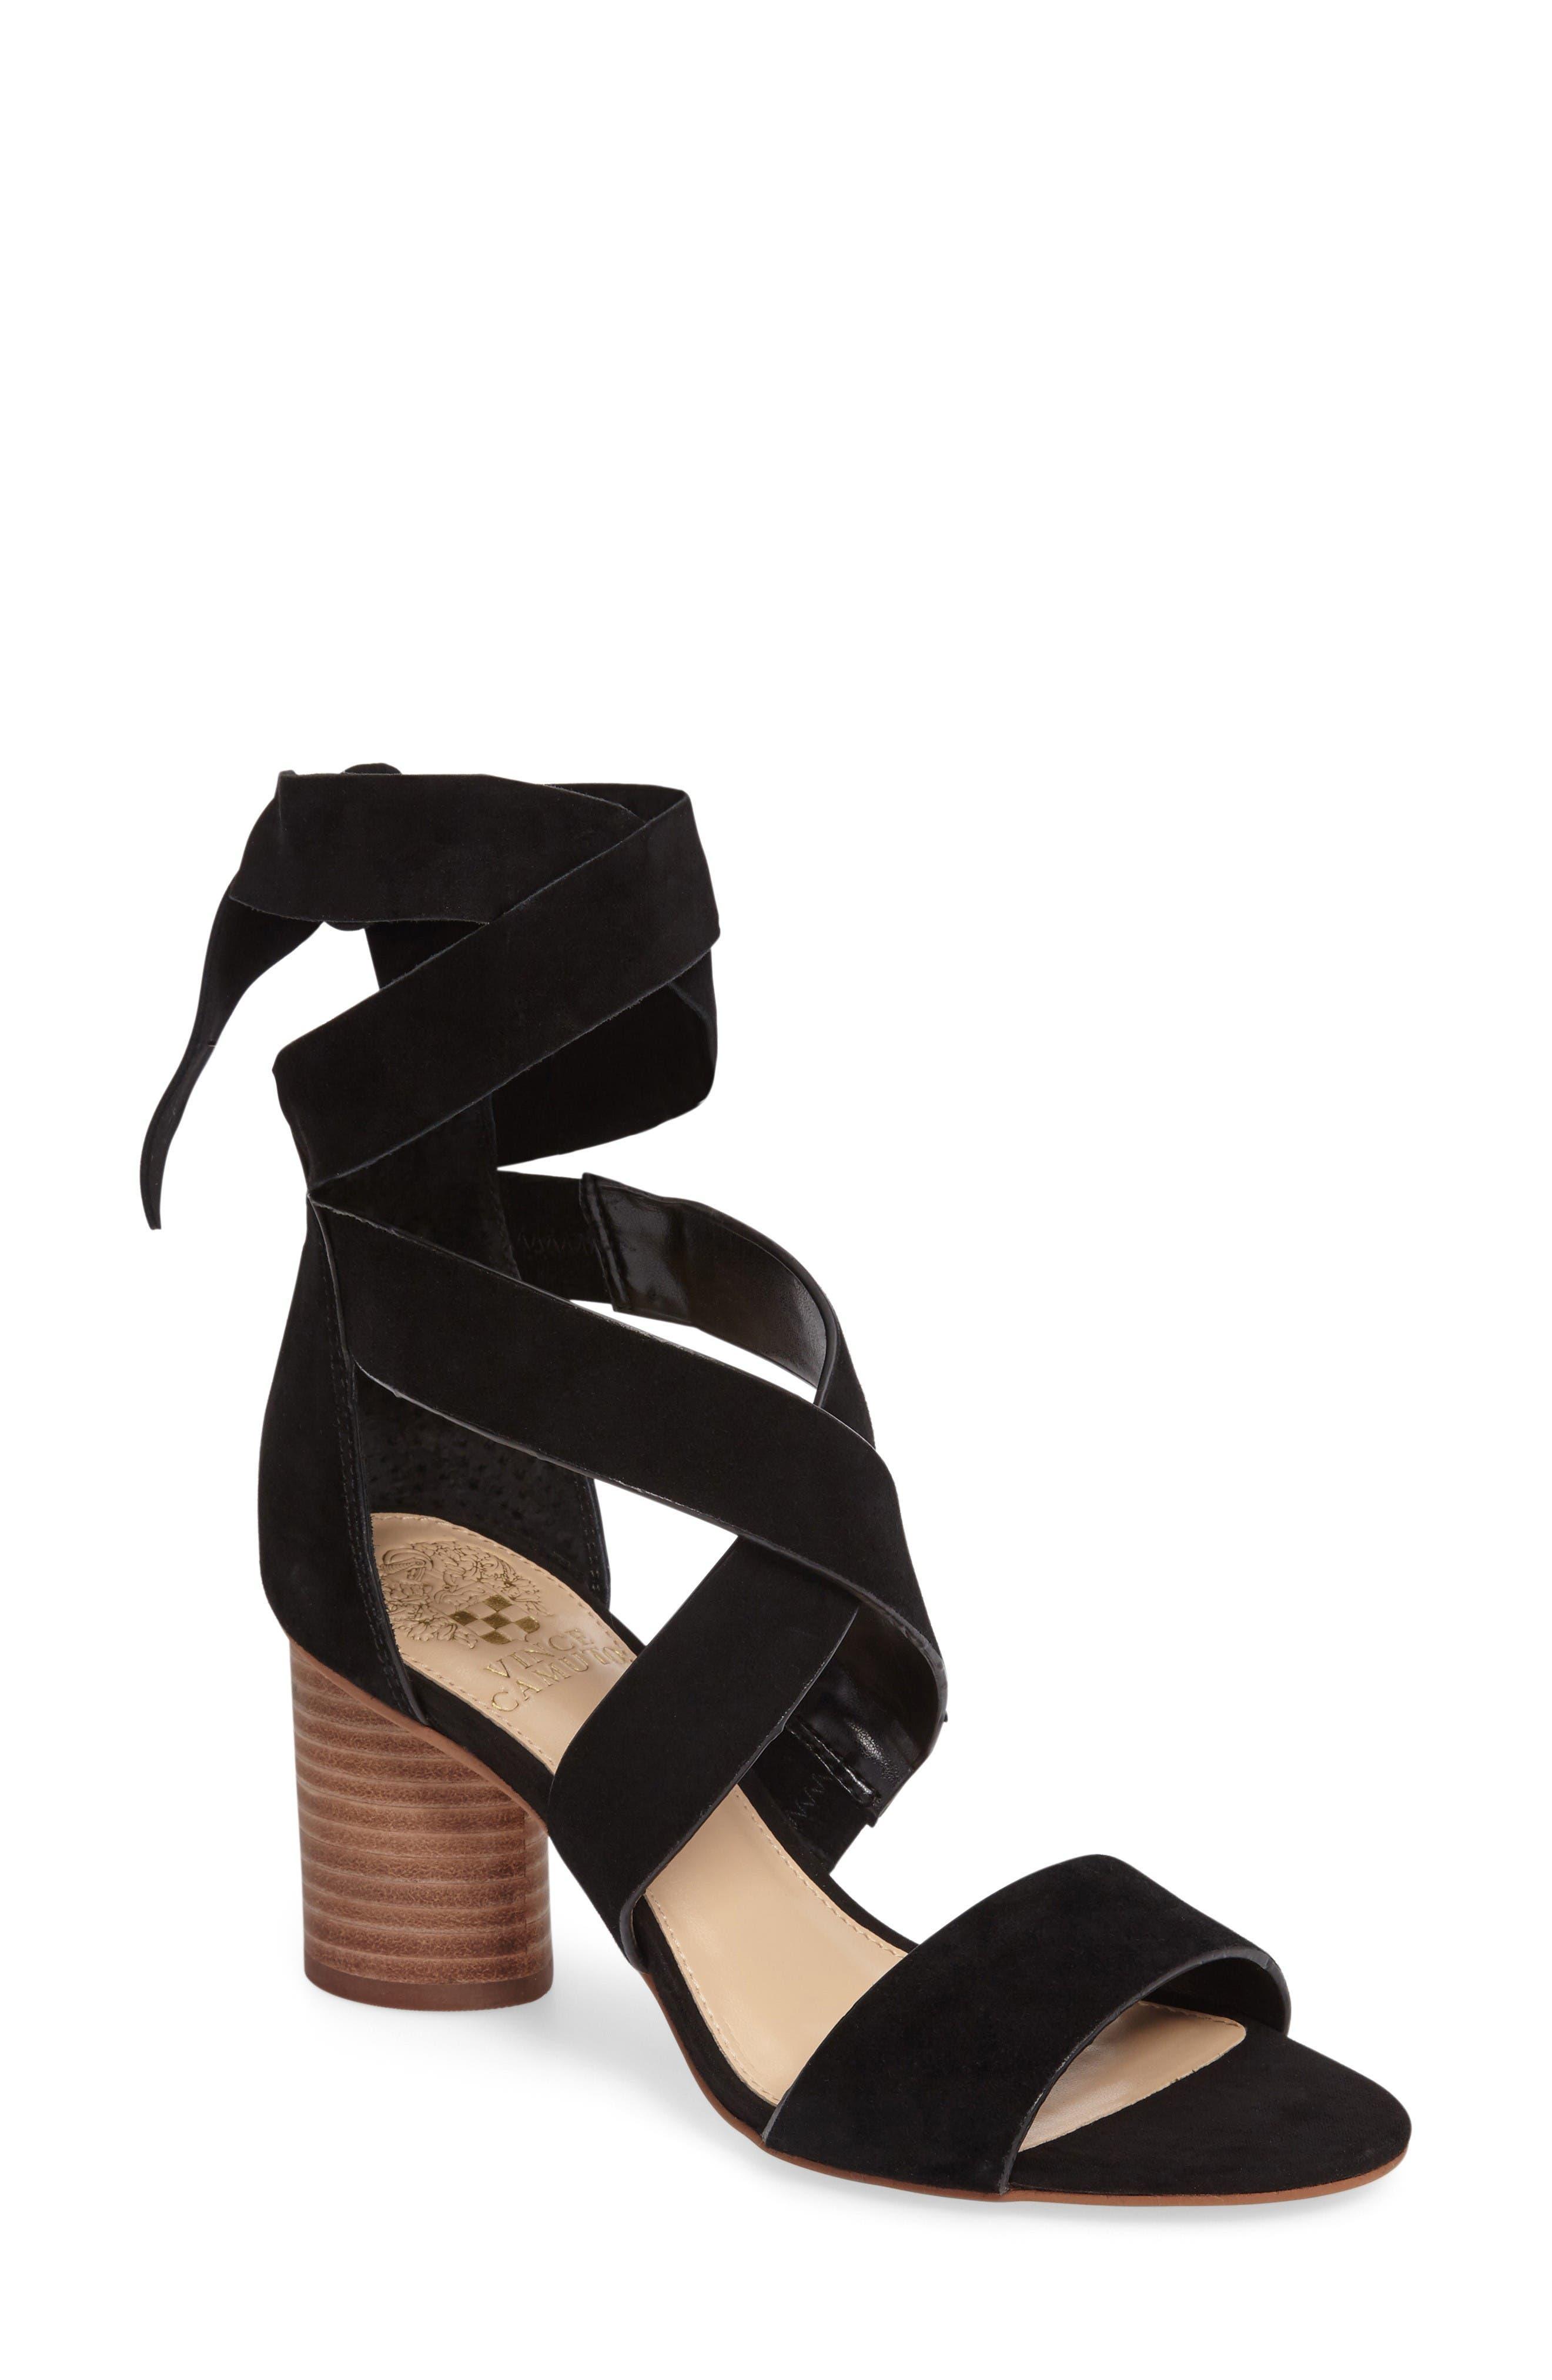 Vince Camuto Jeneve Block Heel Sandal (Women)